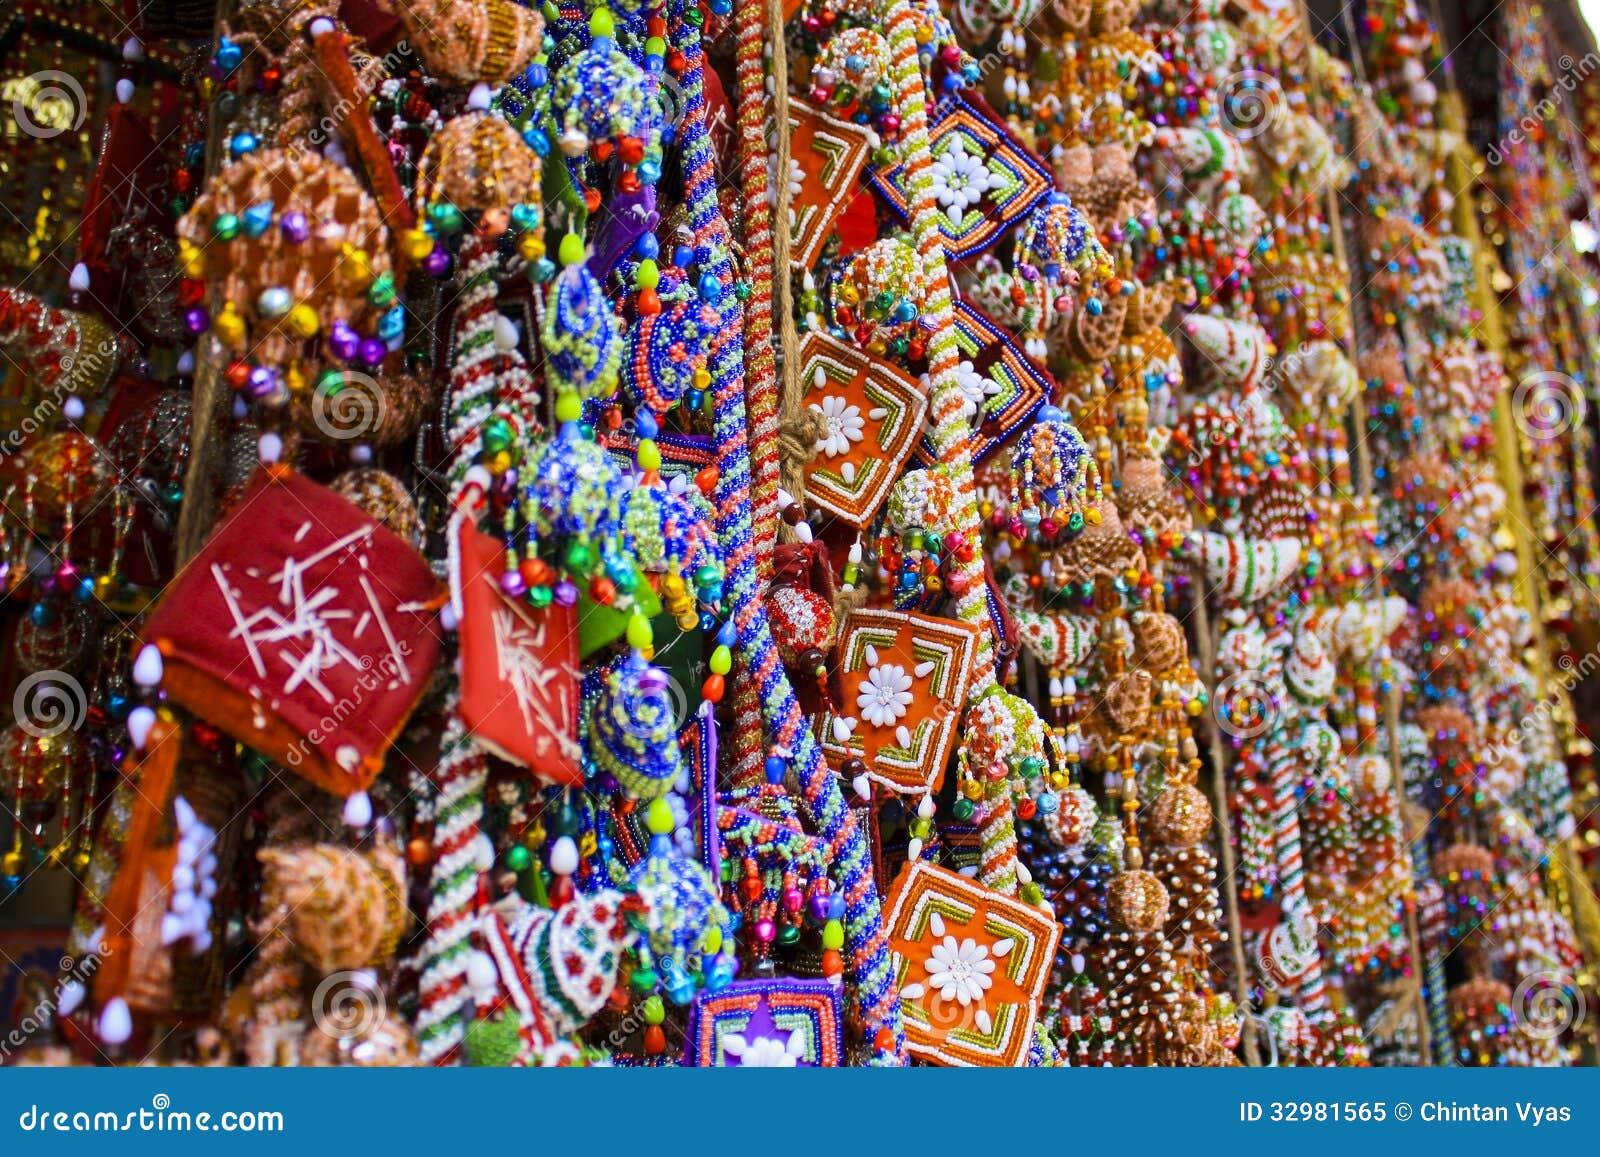 Handicrafts of India Com Handicrafts From India